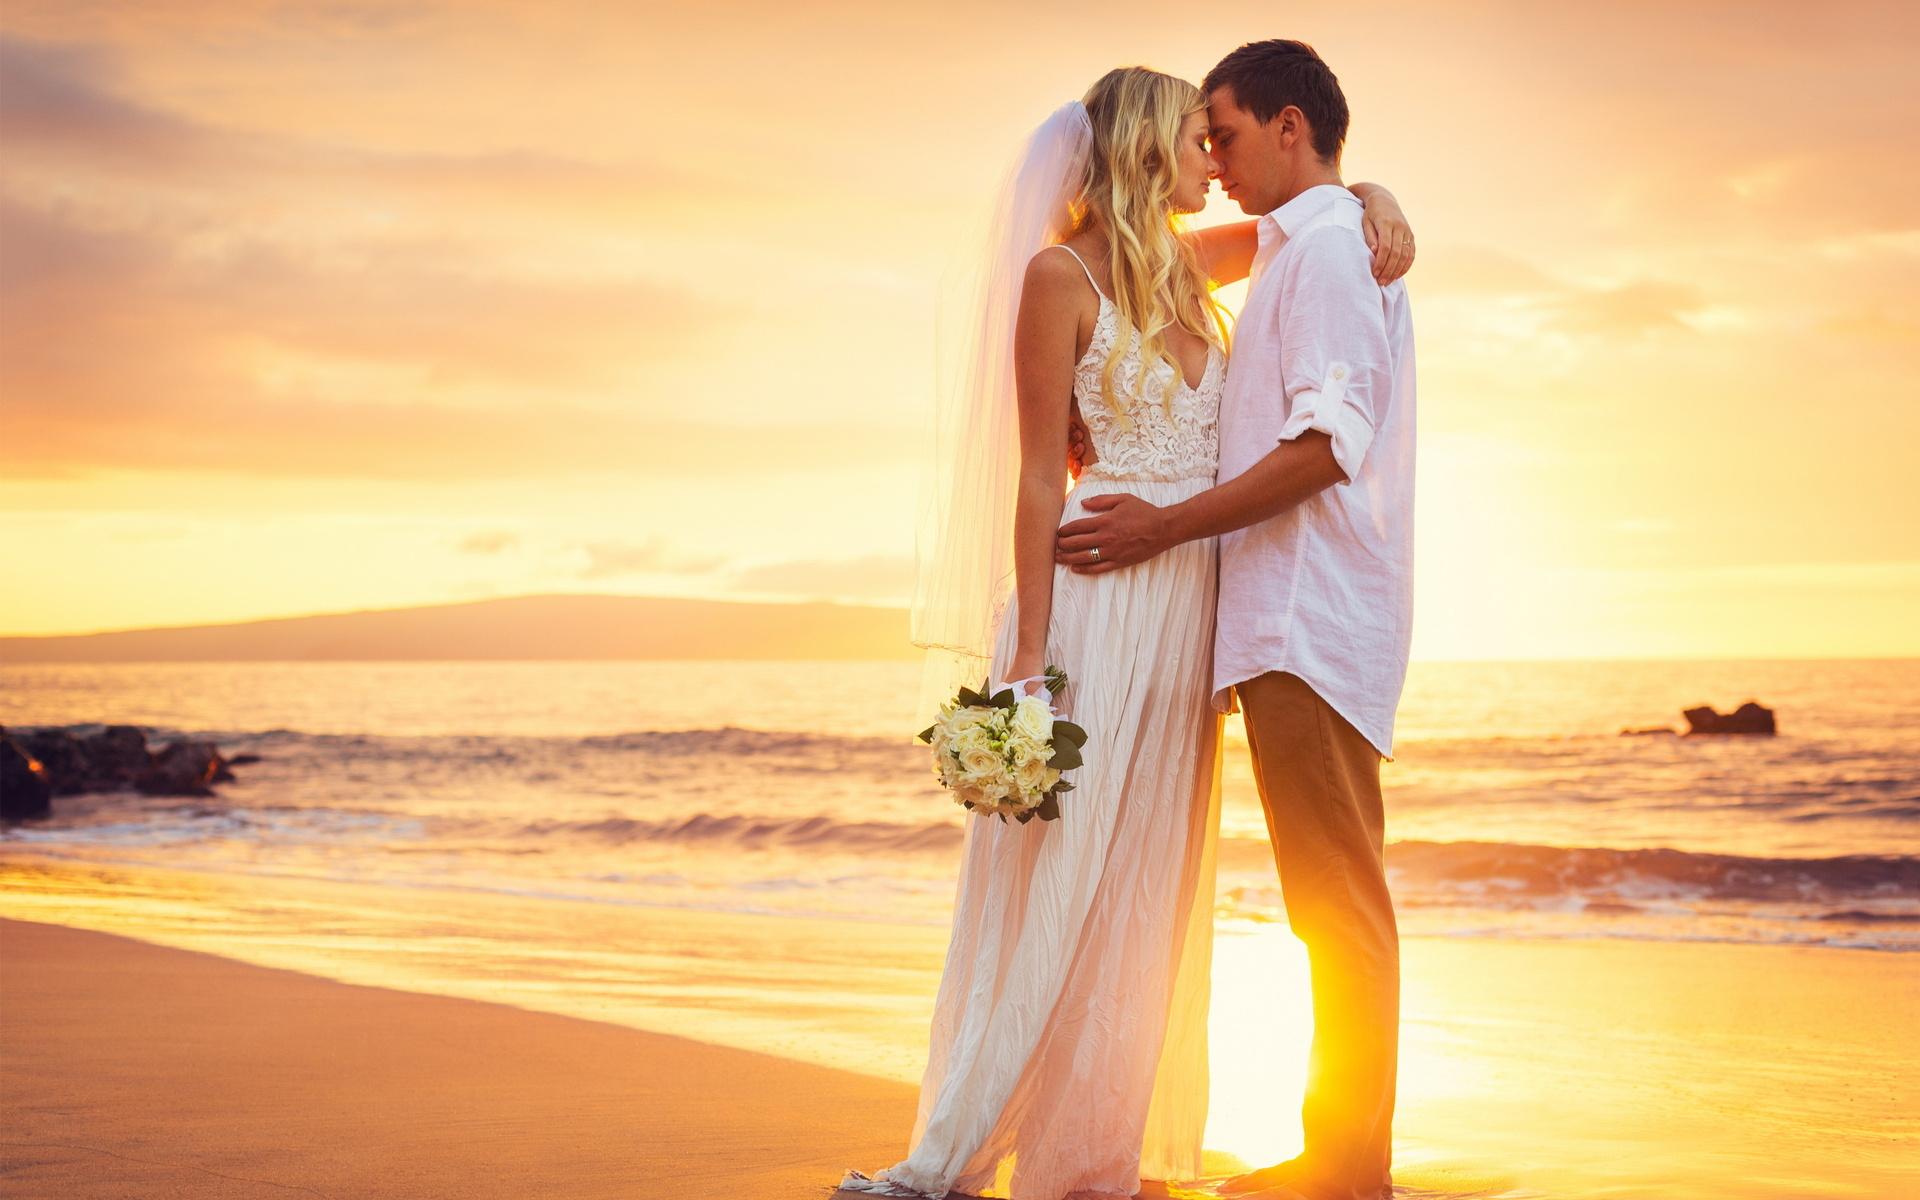 Bride And Groom HD Wallpaper